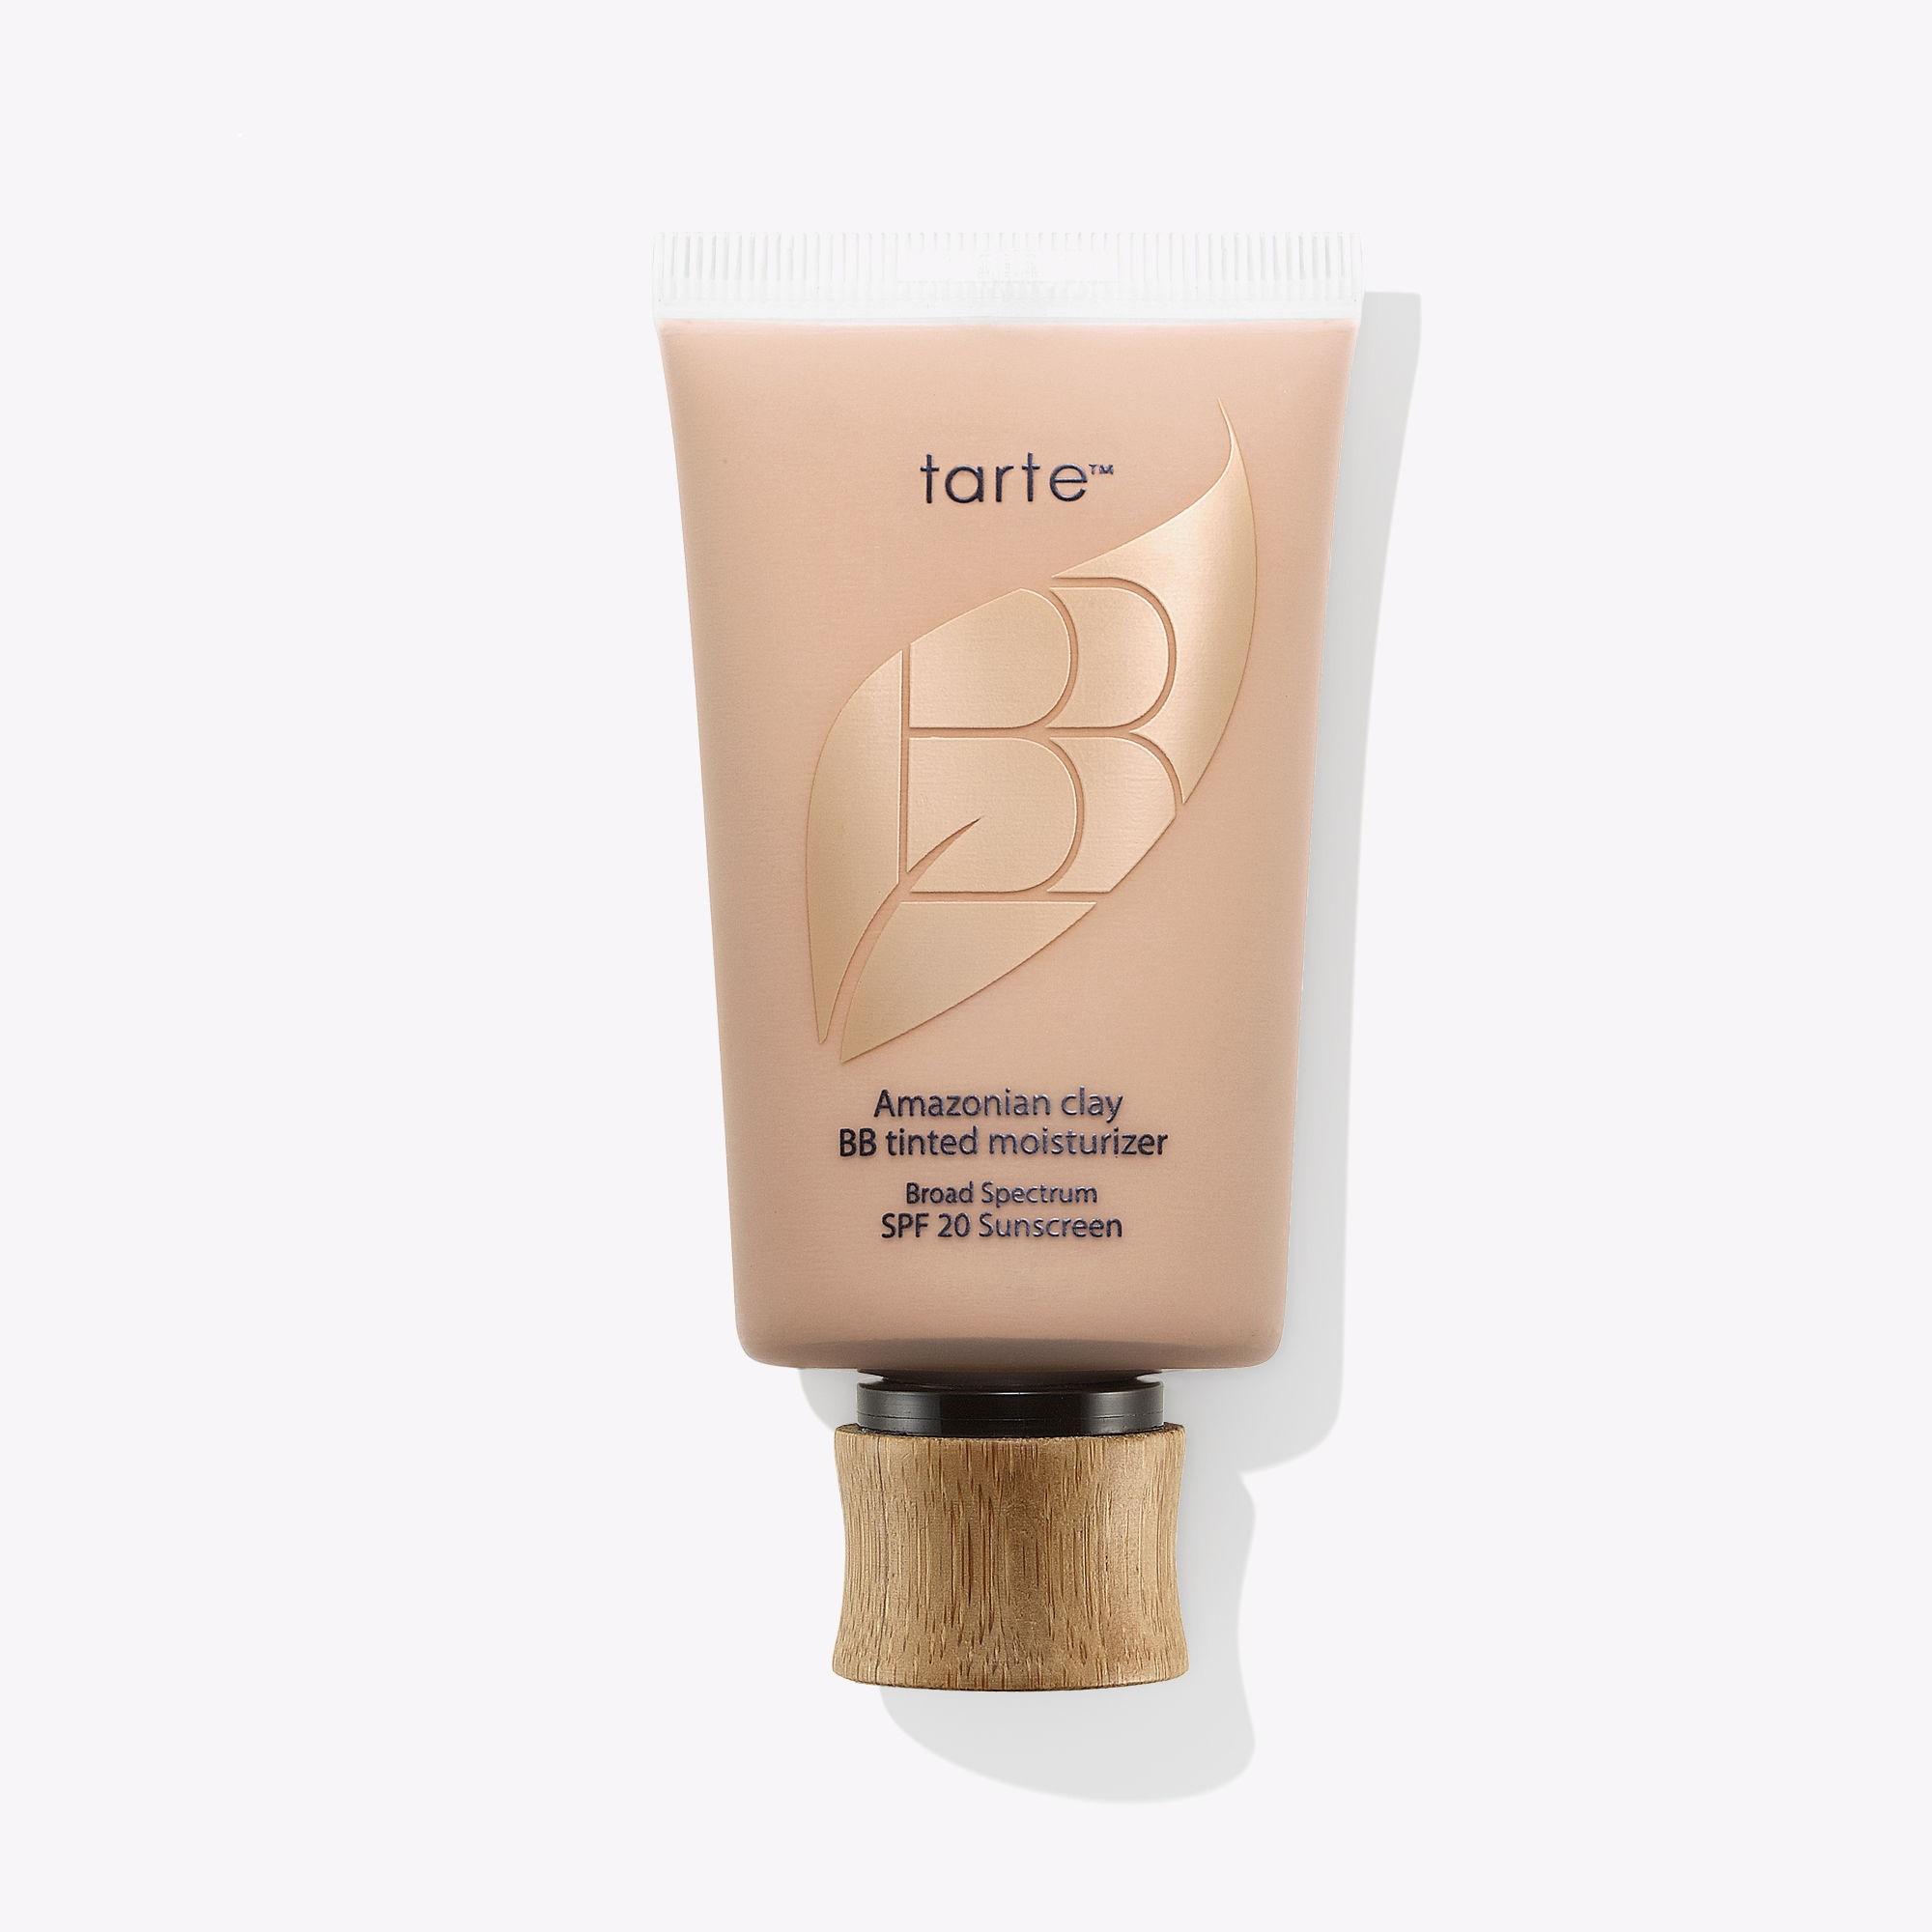 tarte™ Amazonian Clay BB Tinted Moisturizer SPF 20